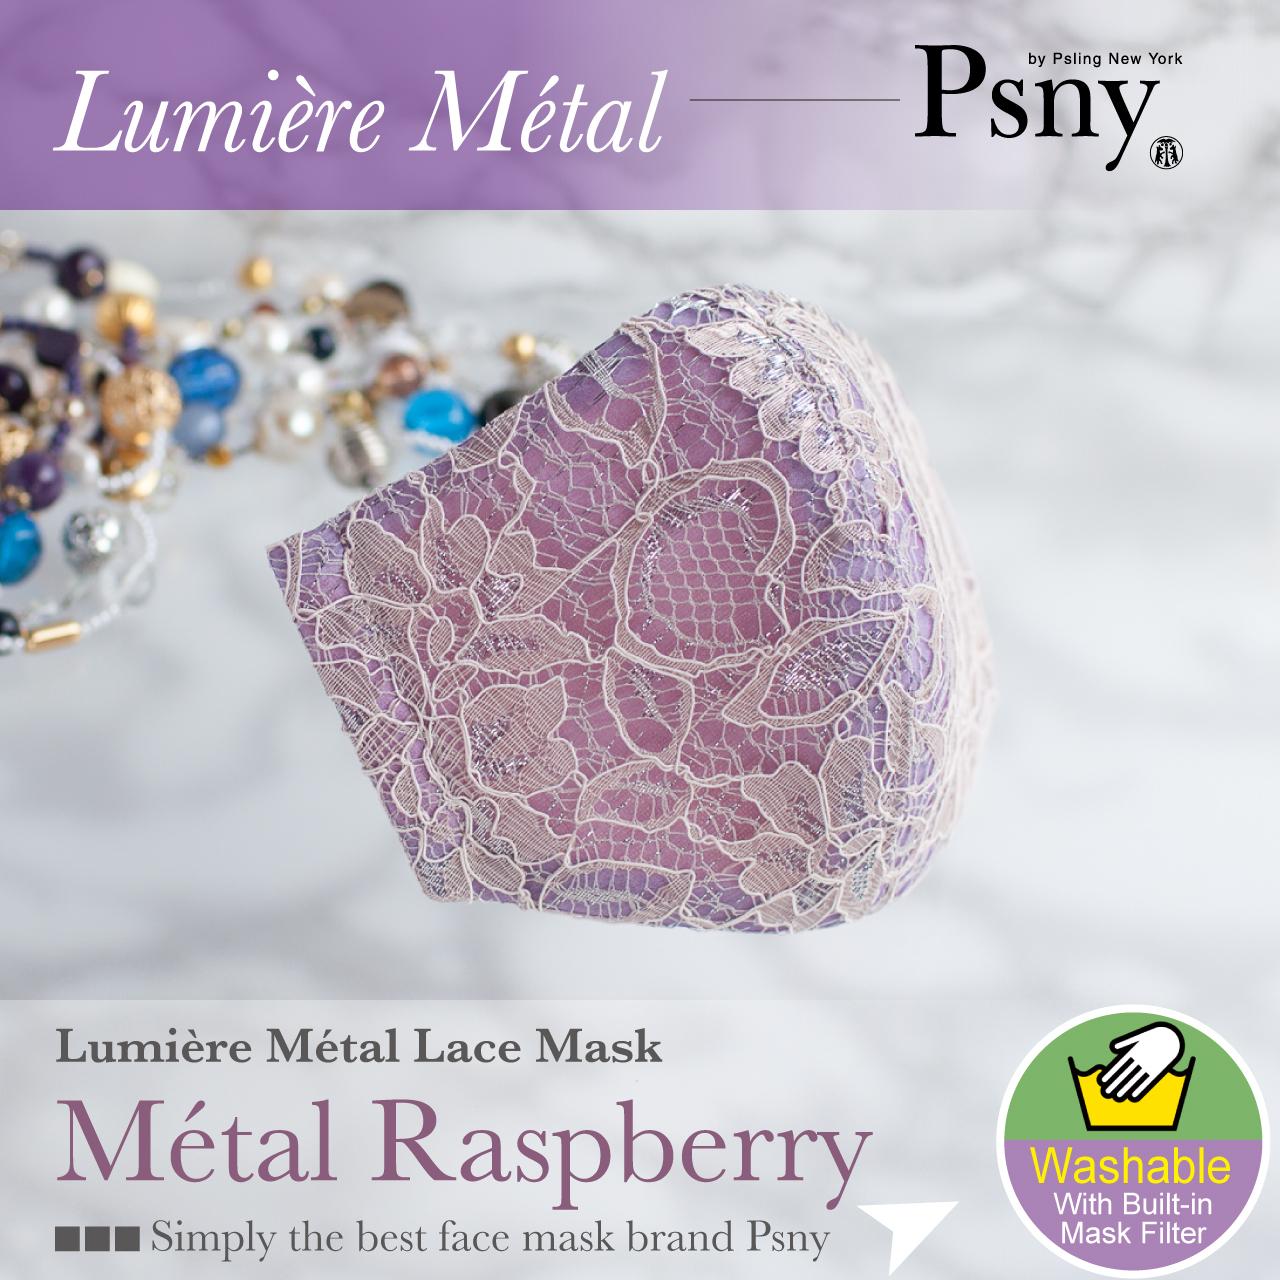 PSNY メタル レース・ラズベリー 花粉 不織布フィルター入り 立体 大人用 美しい 高級 ドレス マスク 送料無料 LM7